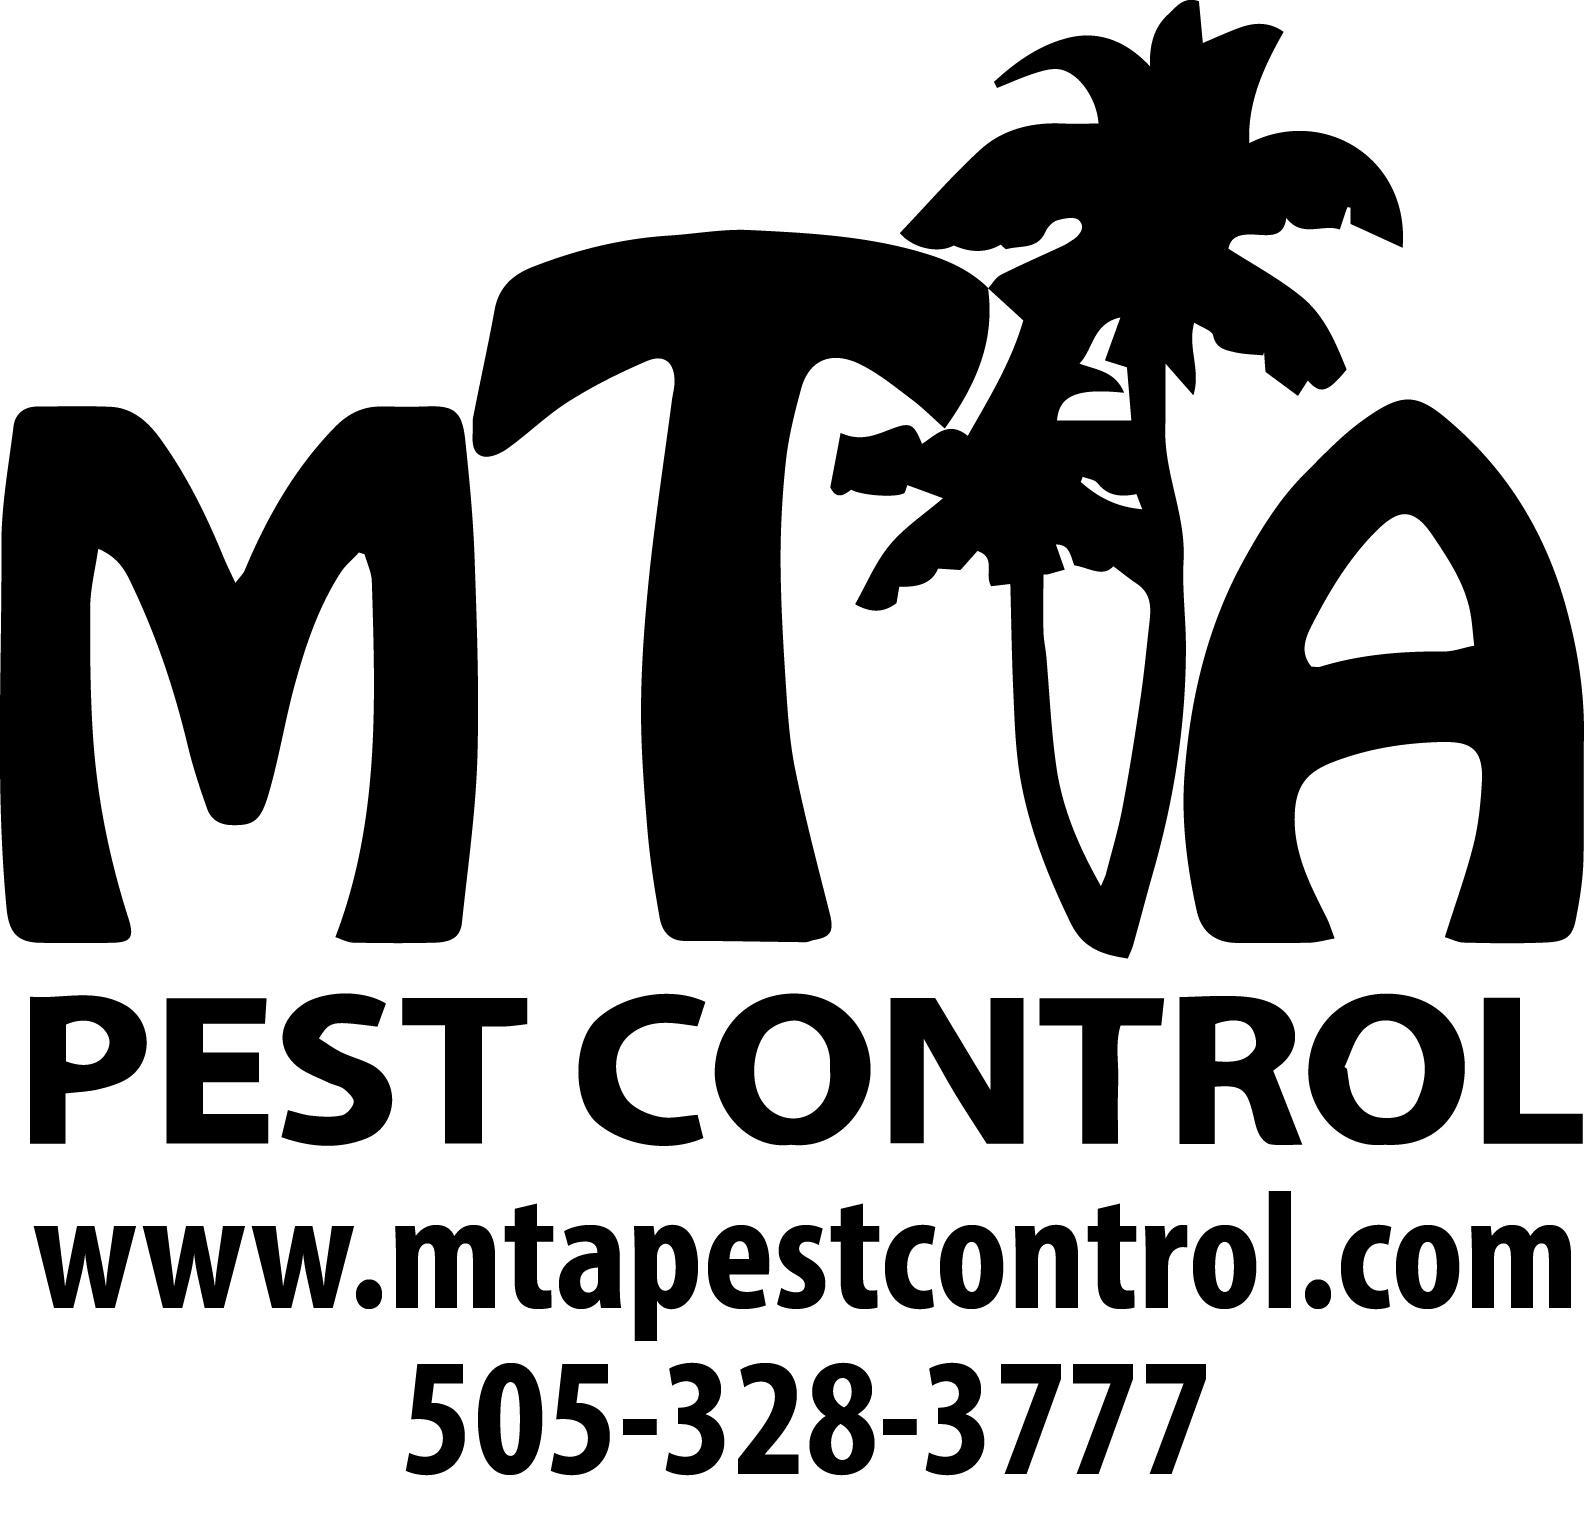 C:\Users\jvosburgh\Dropbox\Jogathon\All Logos\MTA Pest Control Logo .jpg